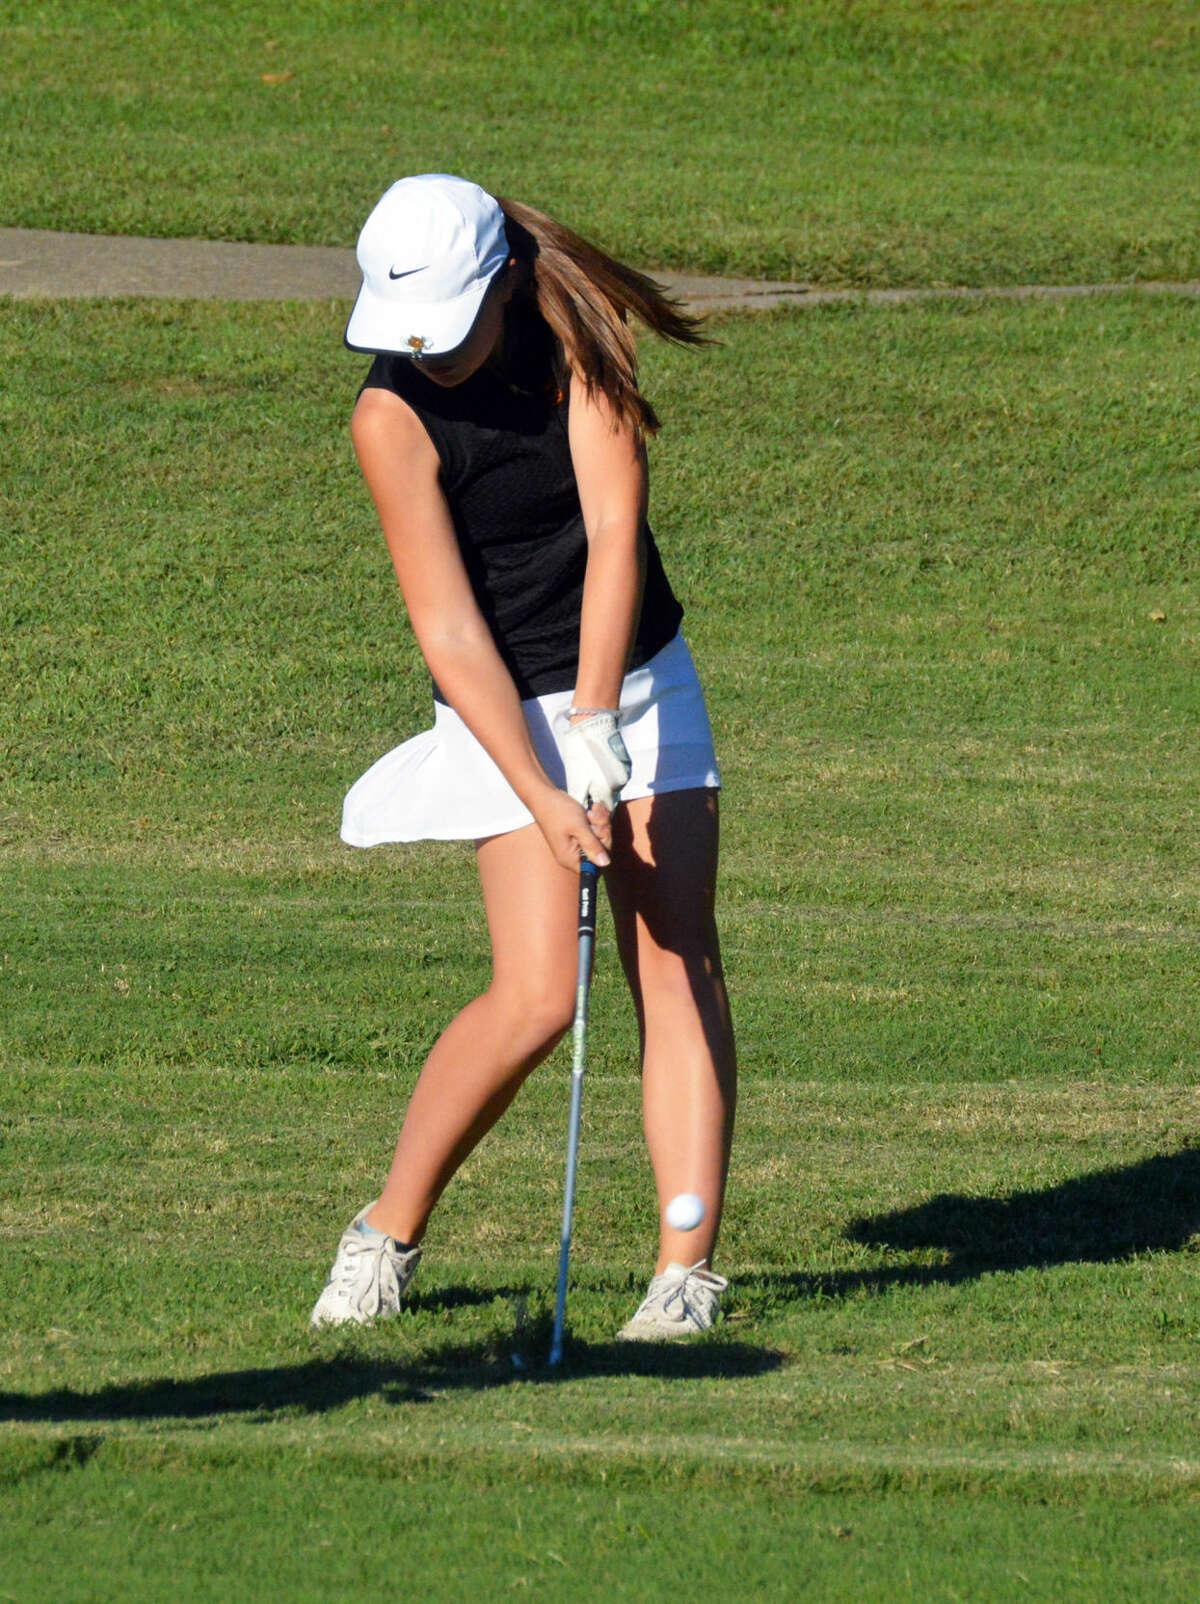 Edwardsville's Jessica Benson hits her second shot.